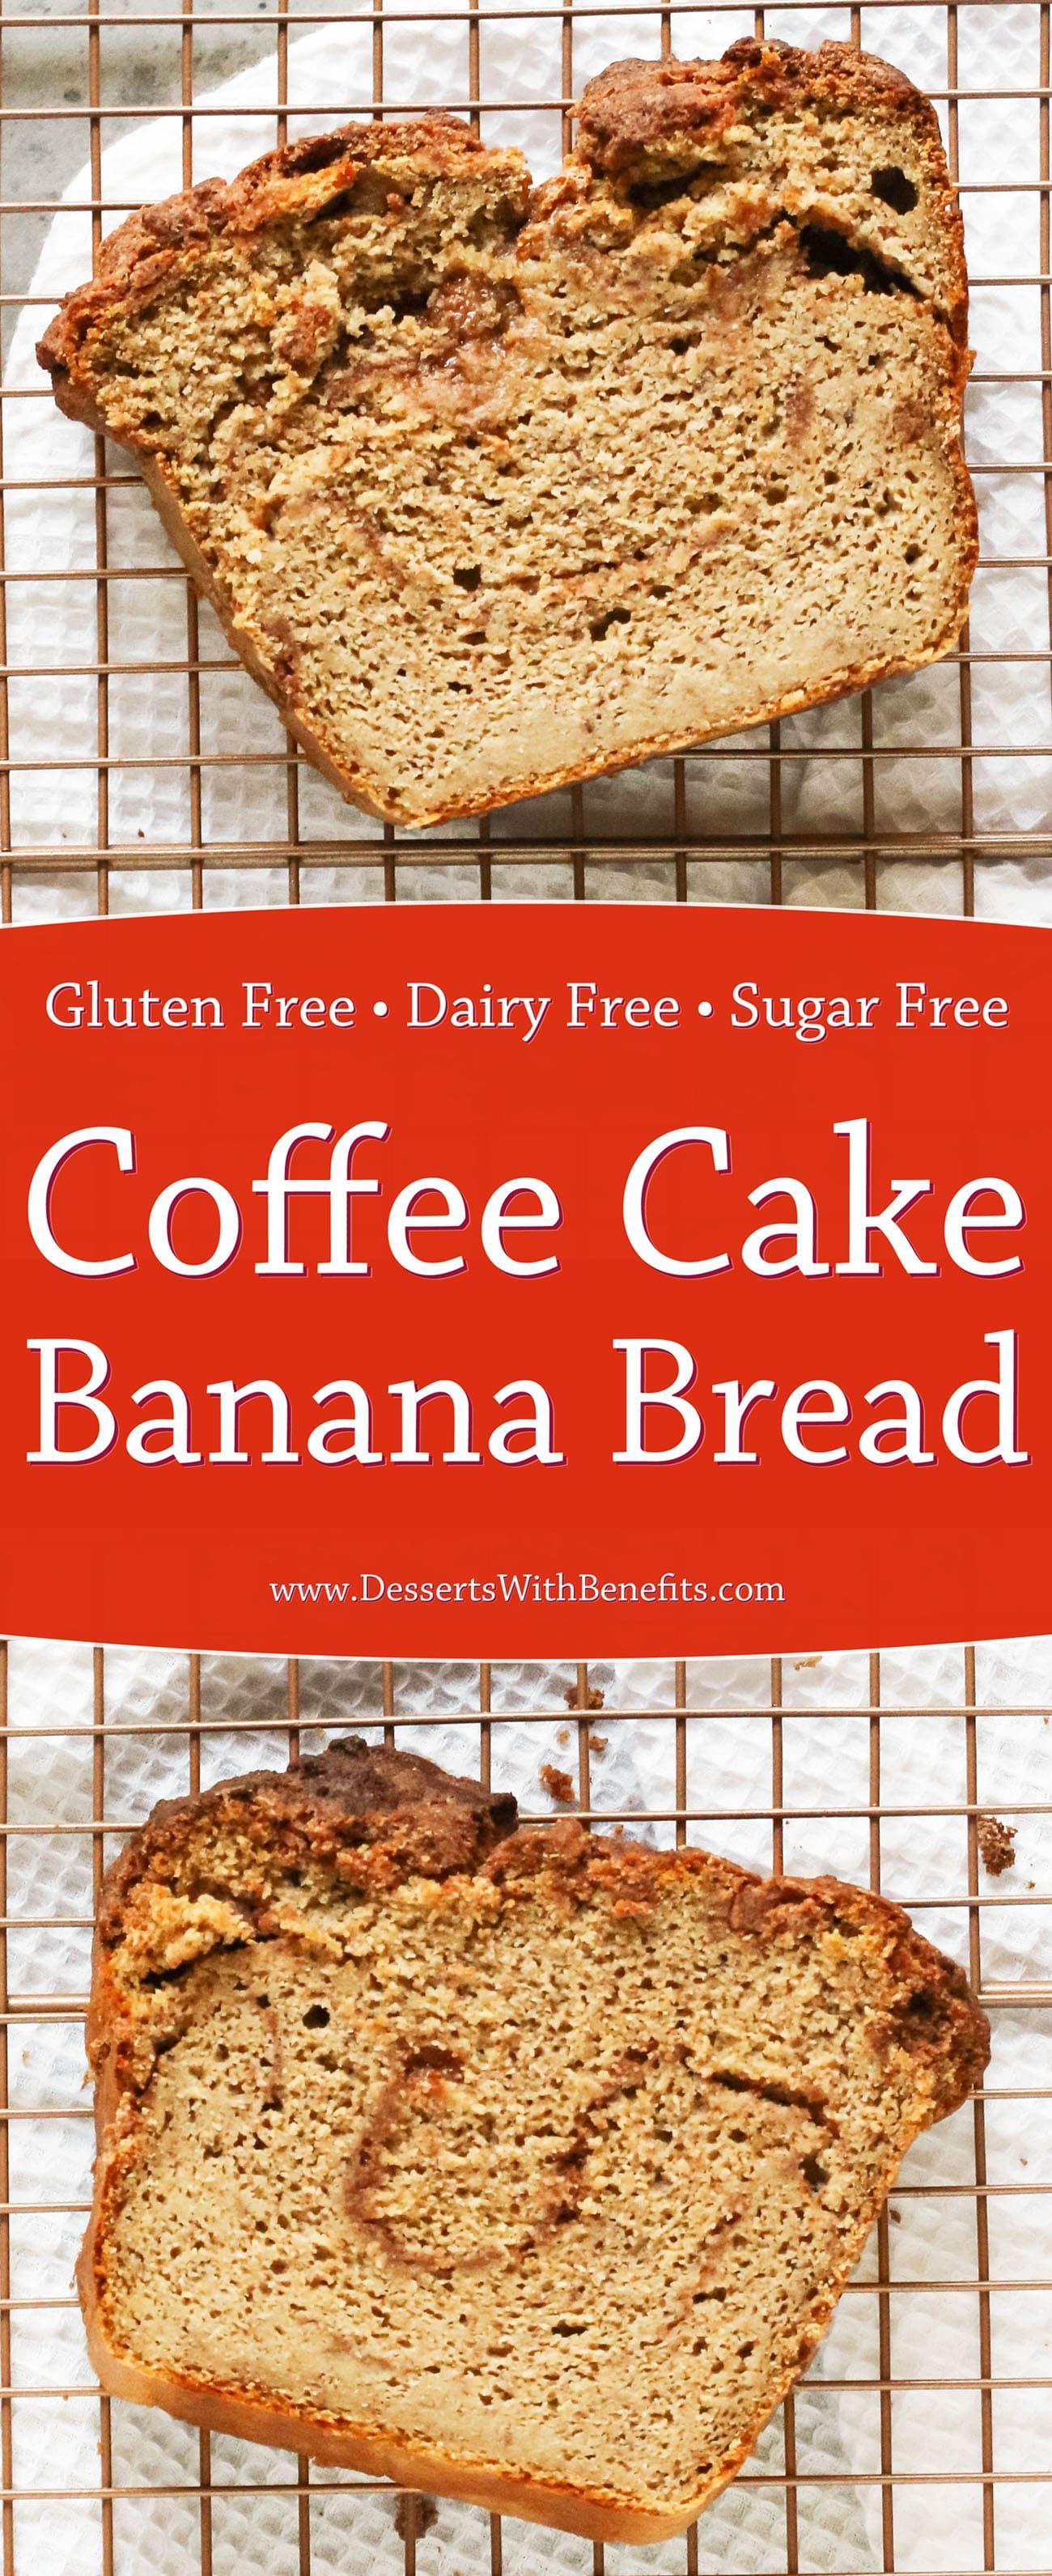 Healthy coffee cake banana bread recipe pinterest coffee cake healthy coffee cake banana bread recipe pinterest coffee cake high protein and banana bread forumfinder Image collections